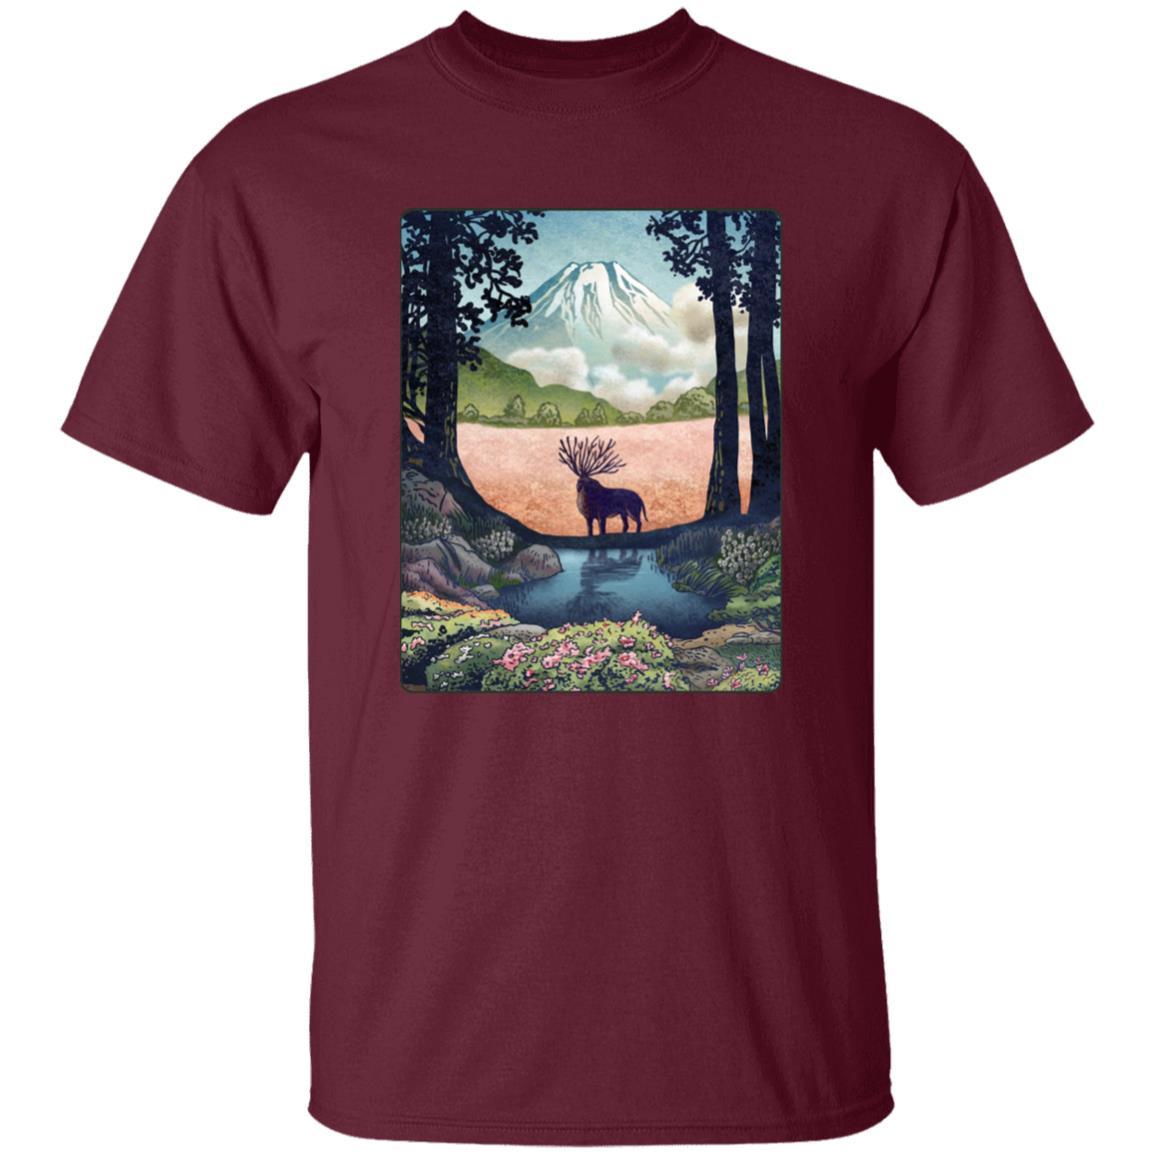 Princess Mononoke – Shishigami Day Time Landscape T Shirt